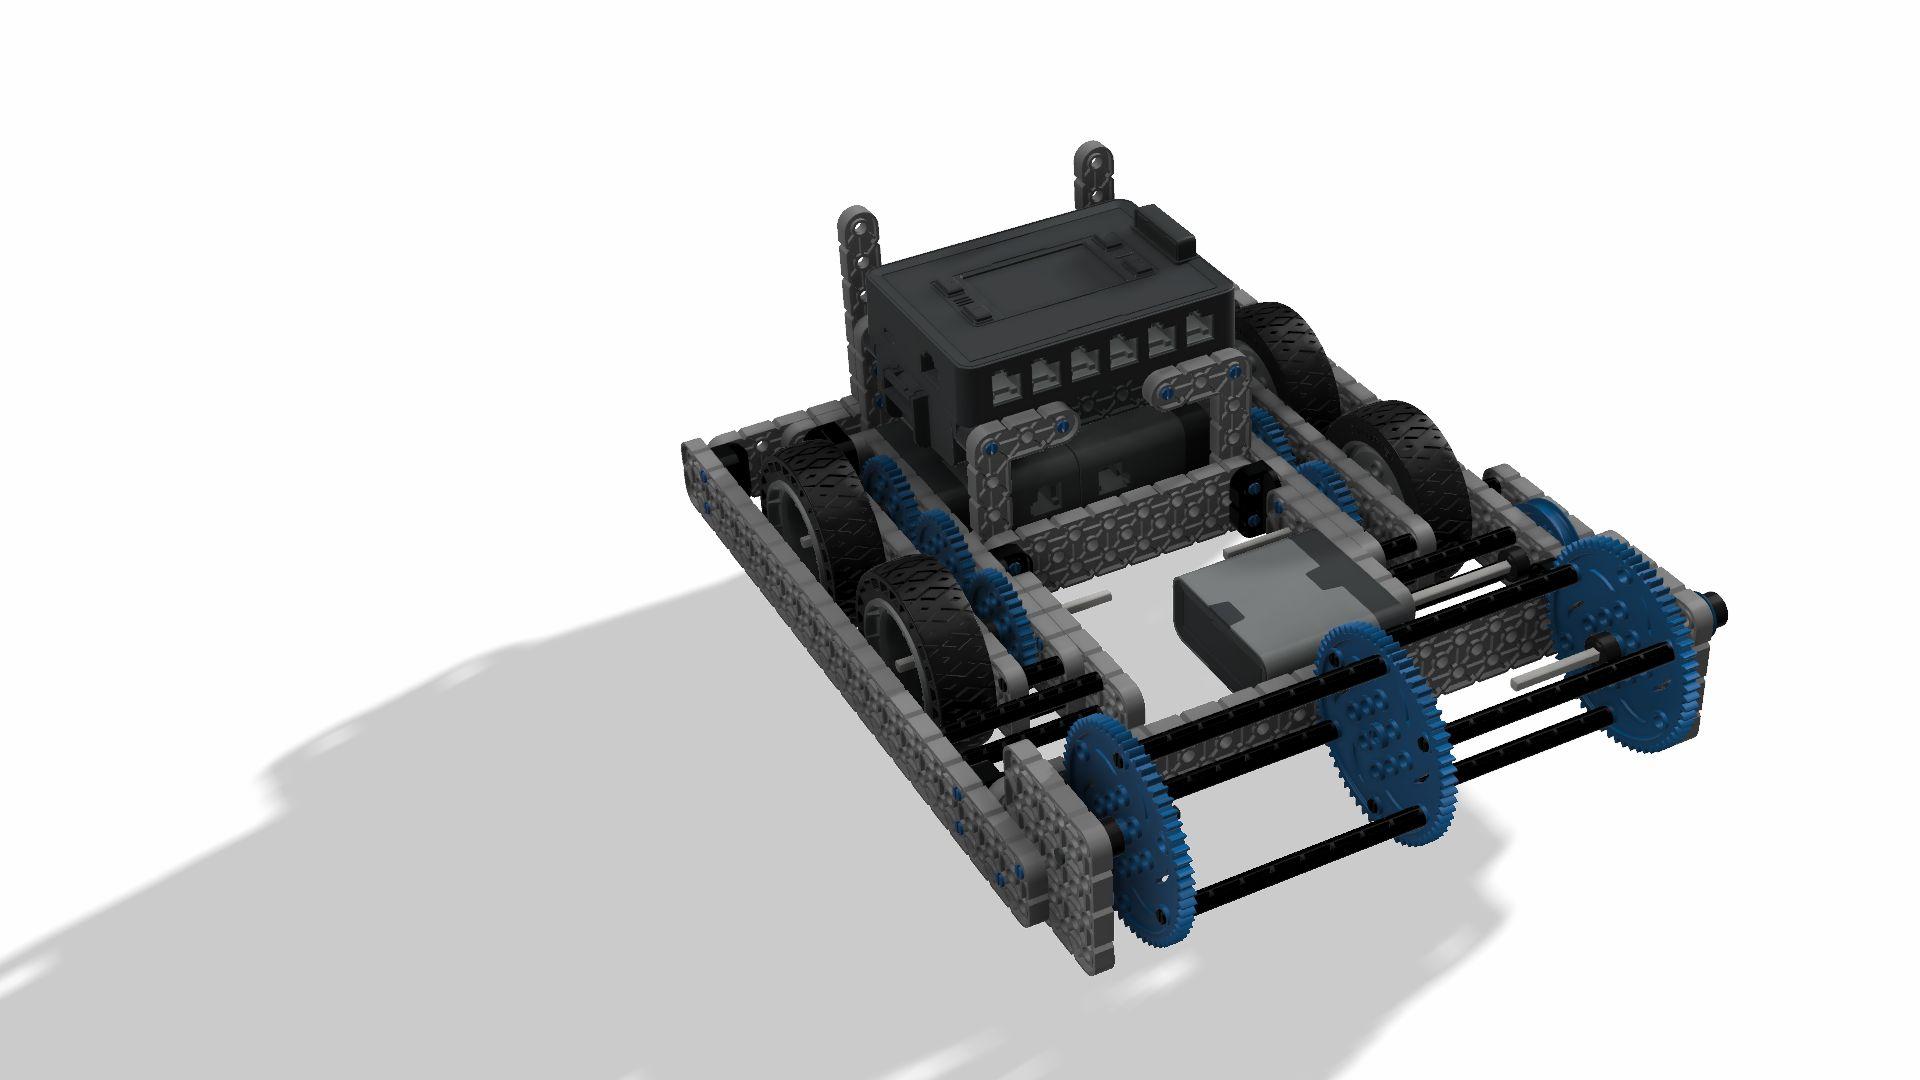 Standard-drive-base-2-v11-v21dcddc-3500-3500